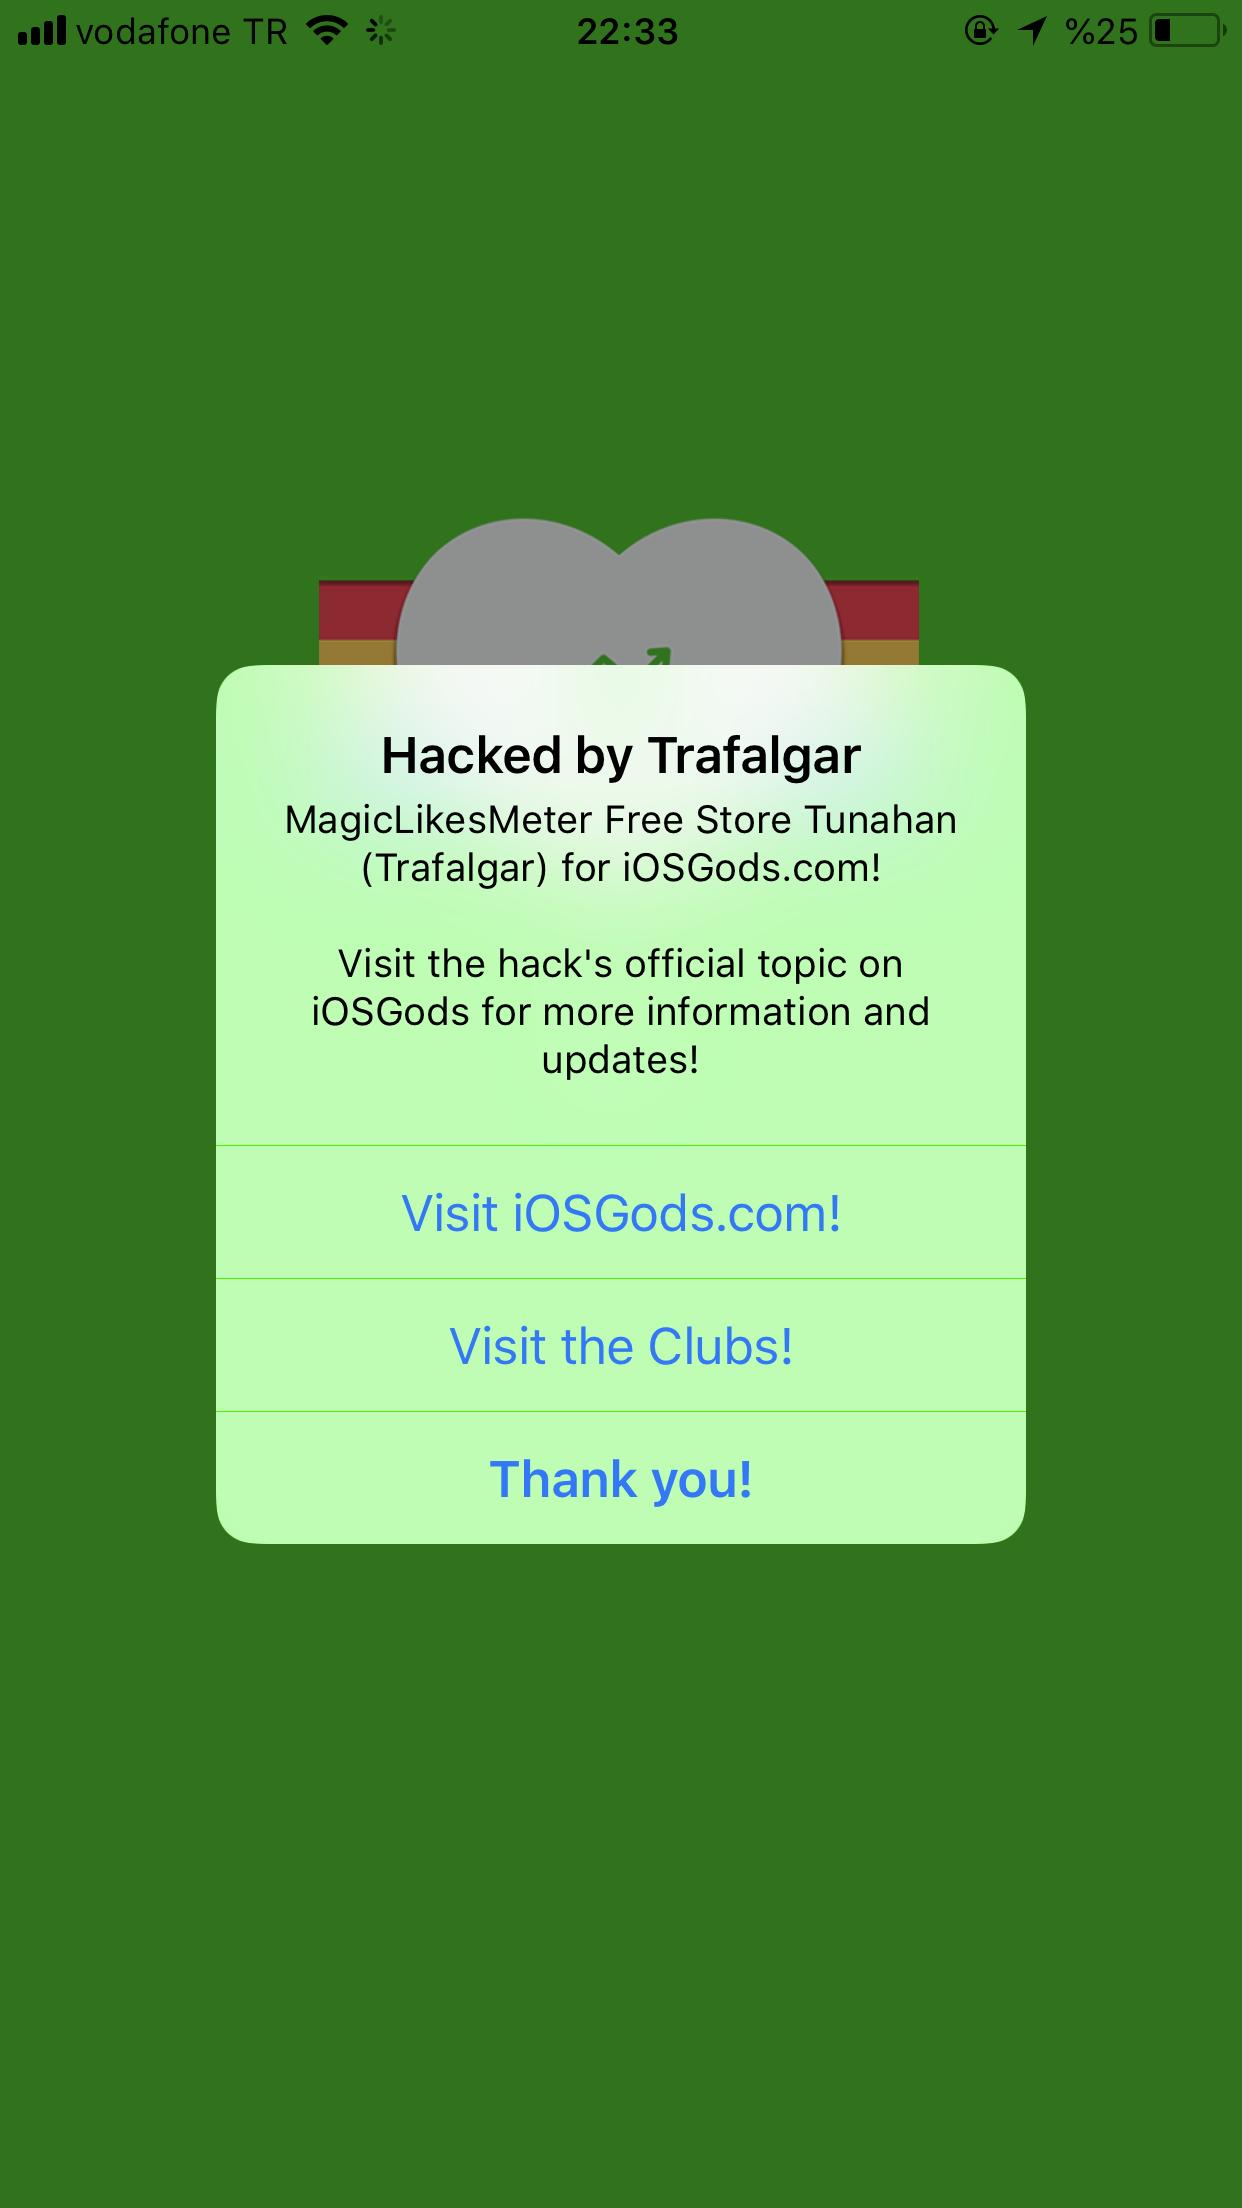 Tweak Hack] MagicLikesMeter +1 [FREE STORE] - Free